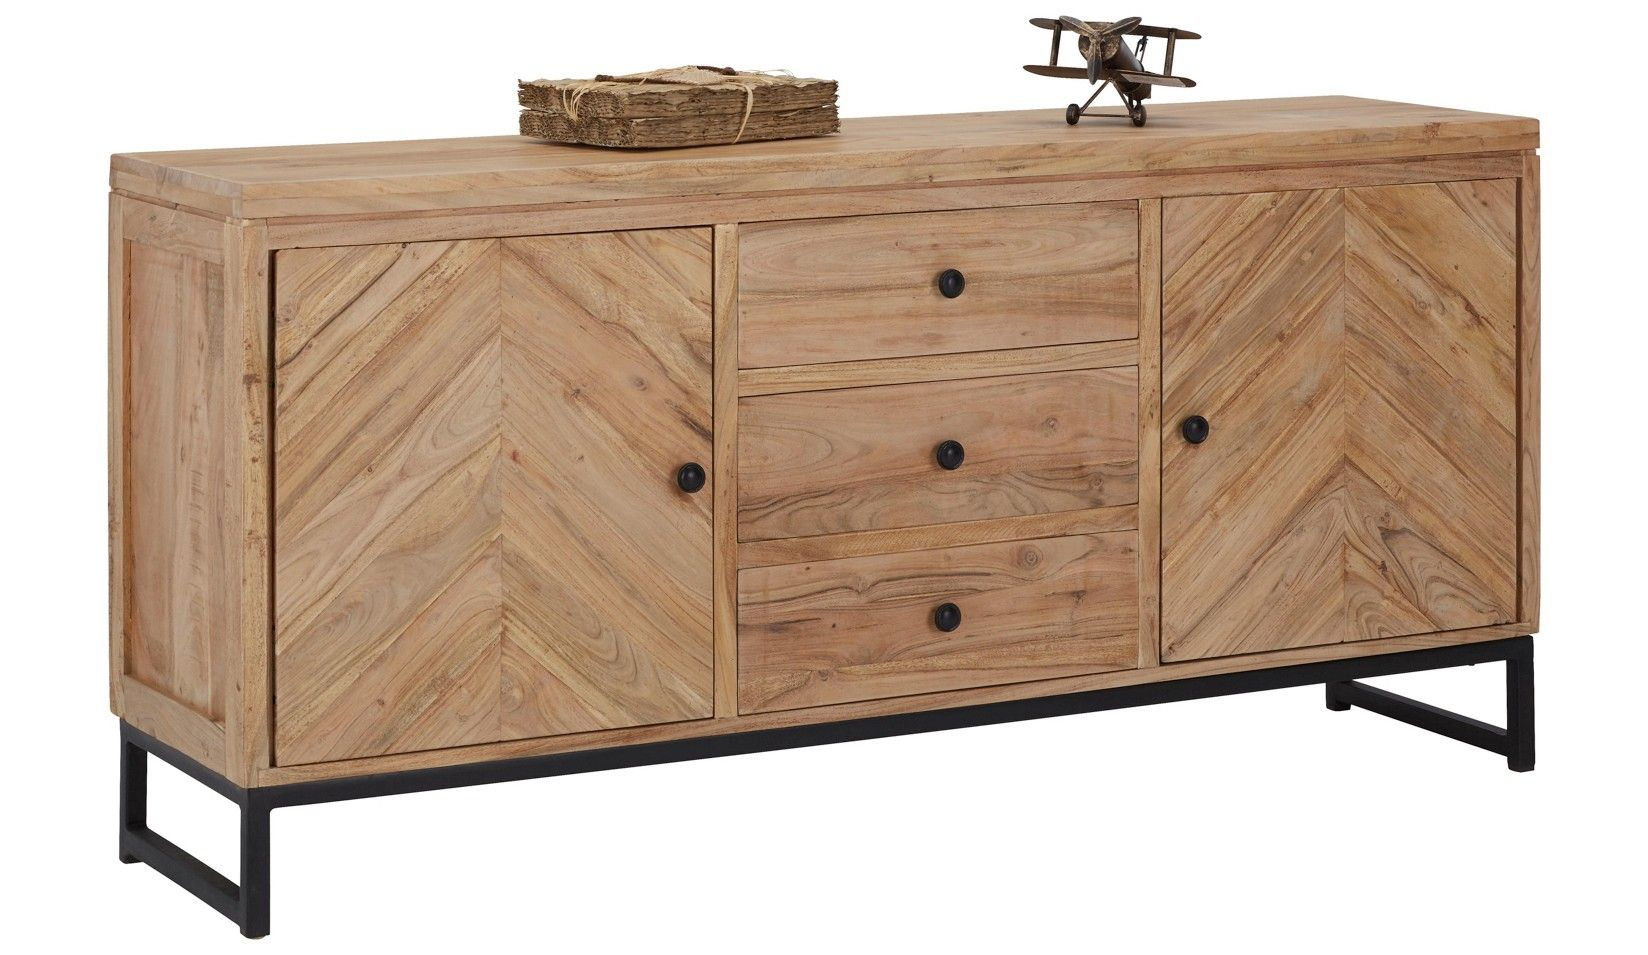 Sideboard in Schwarz/akaziefarben - Schwarz/Akaziefarben, LIFESTYLE, Holz/Metall (160/75/40cm) - ZANDIARA